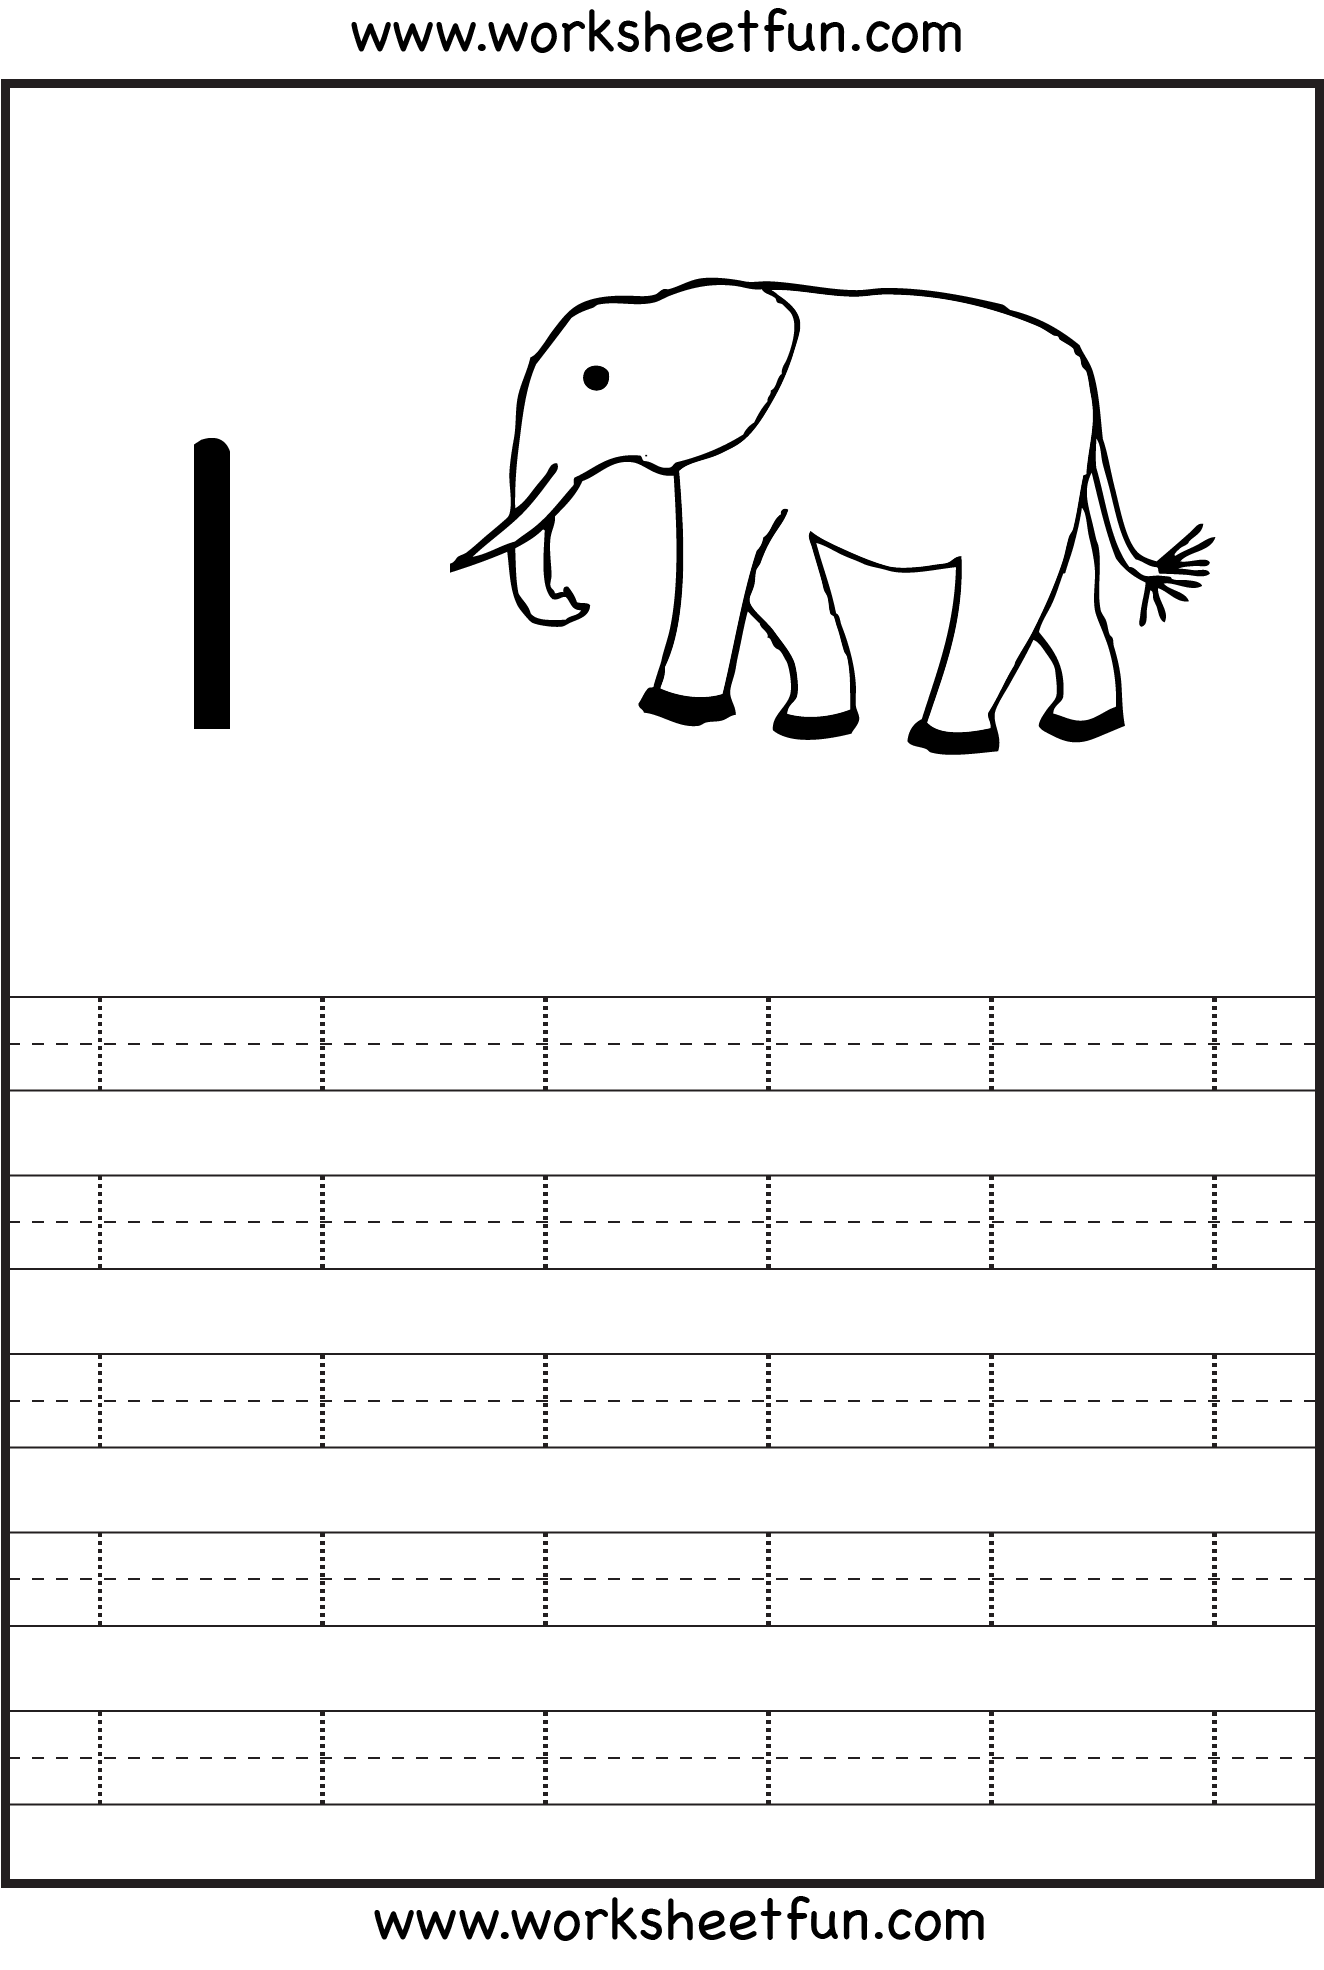 Number 1 Tracing Worksheets Preschool | Tracing Worksheets